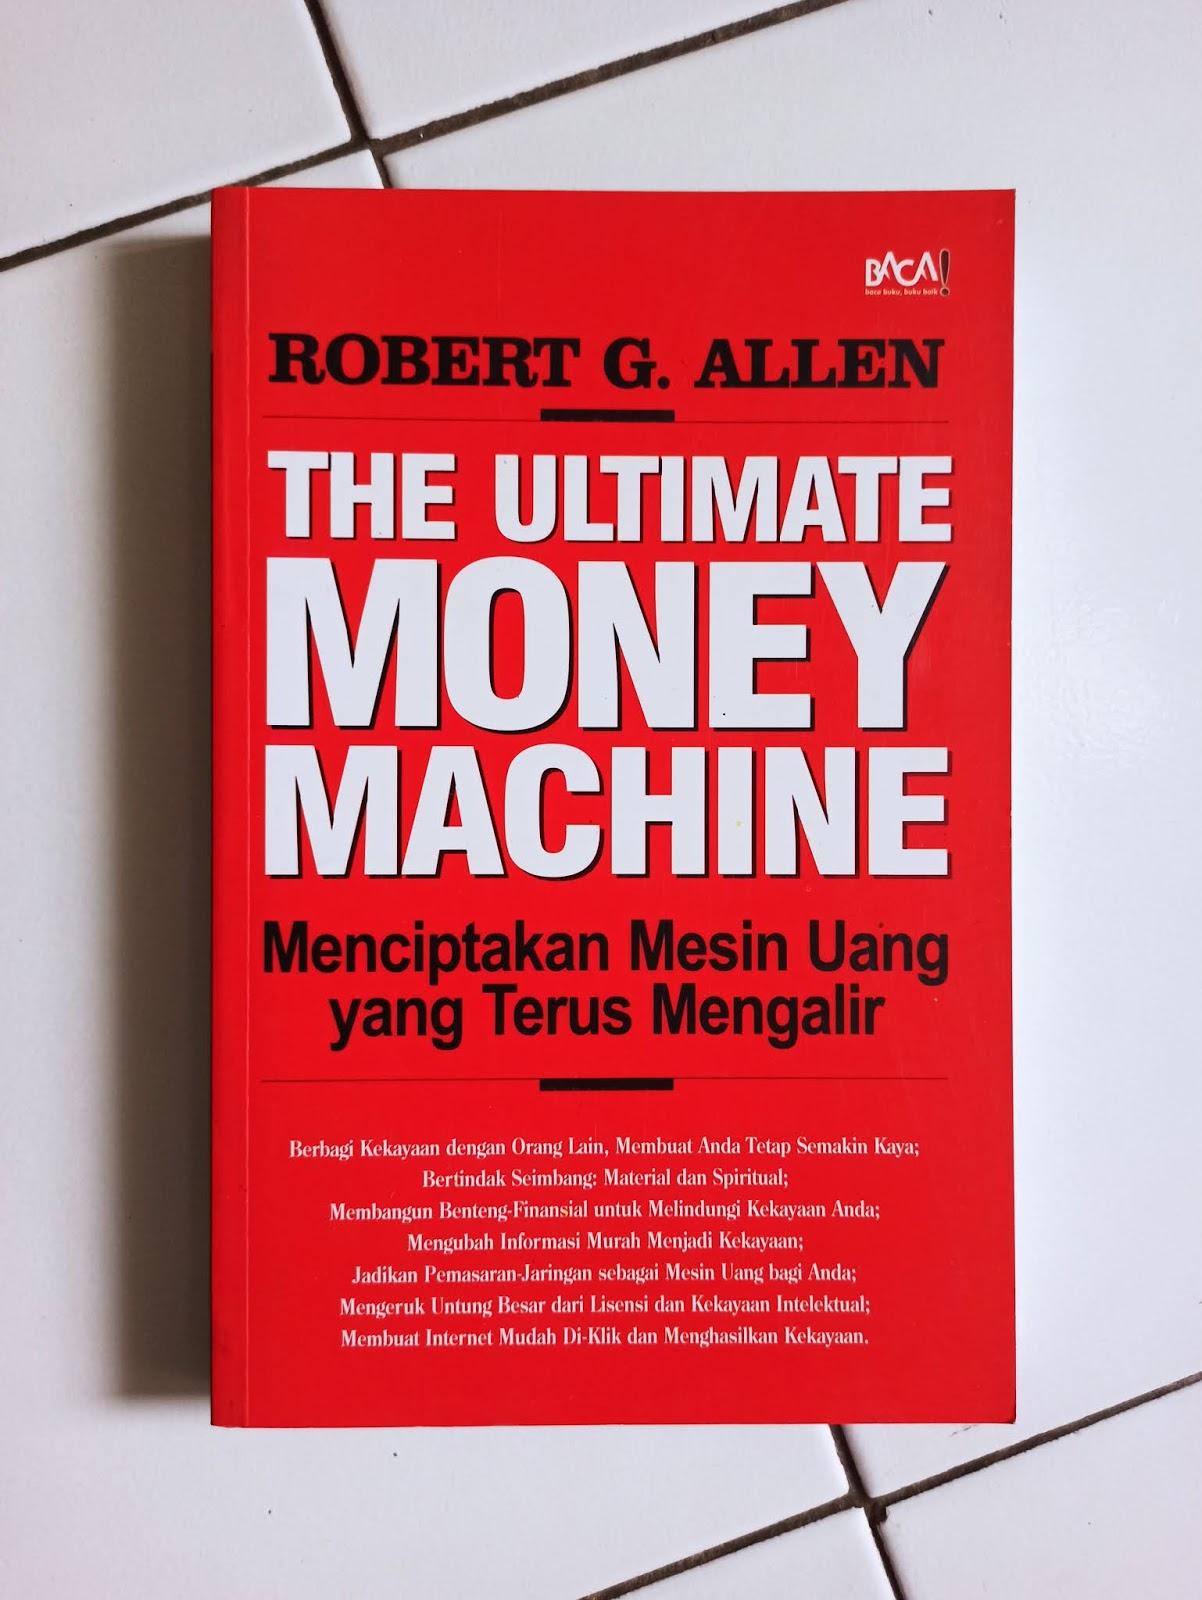 Buku Bisnis The Ultimate Money Machine